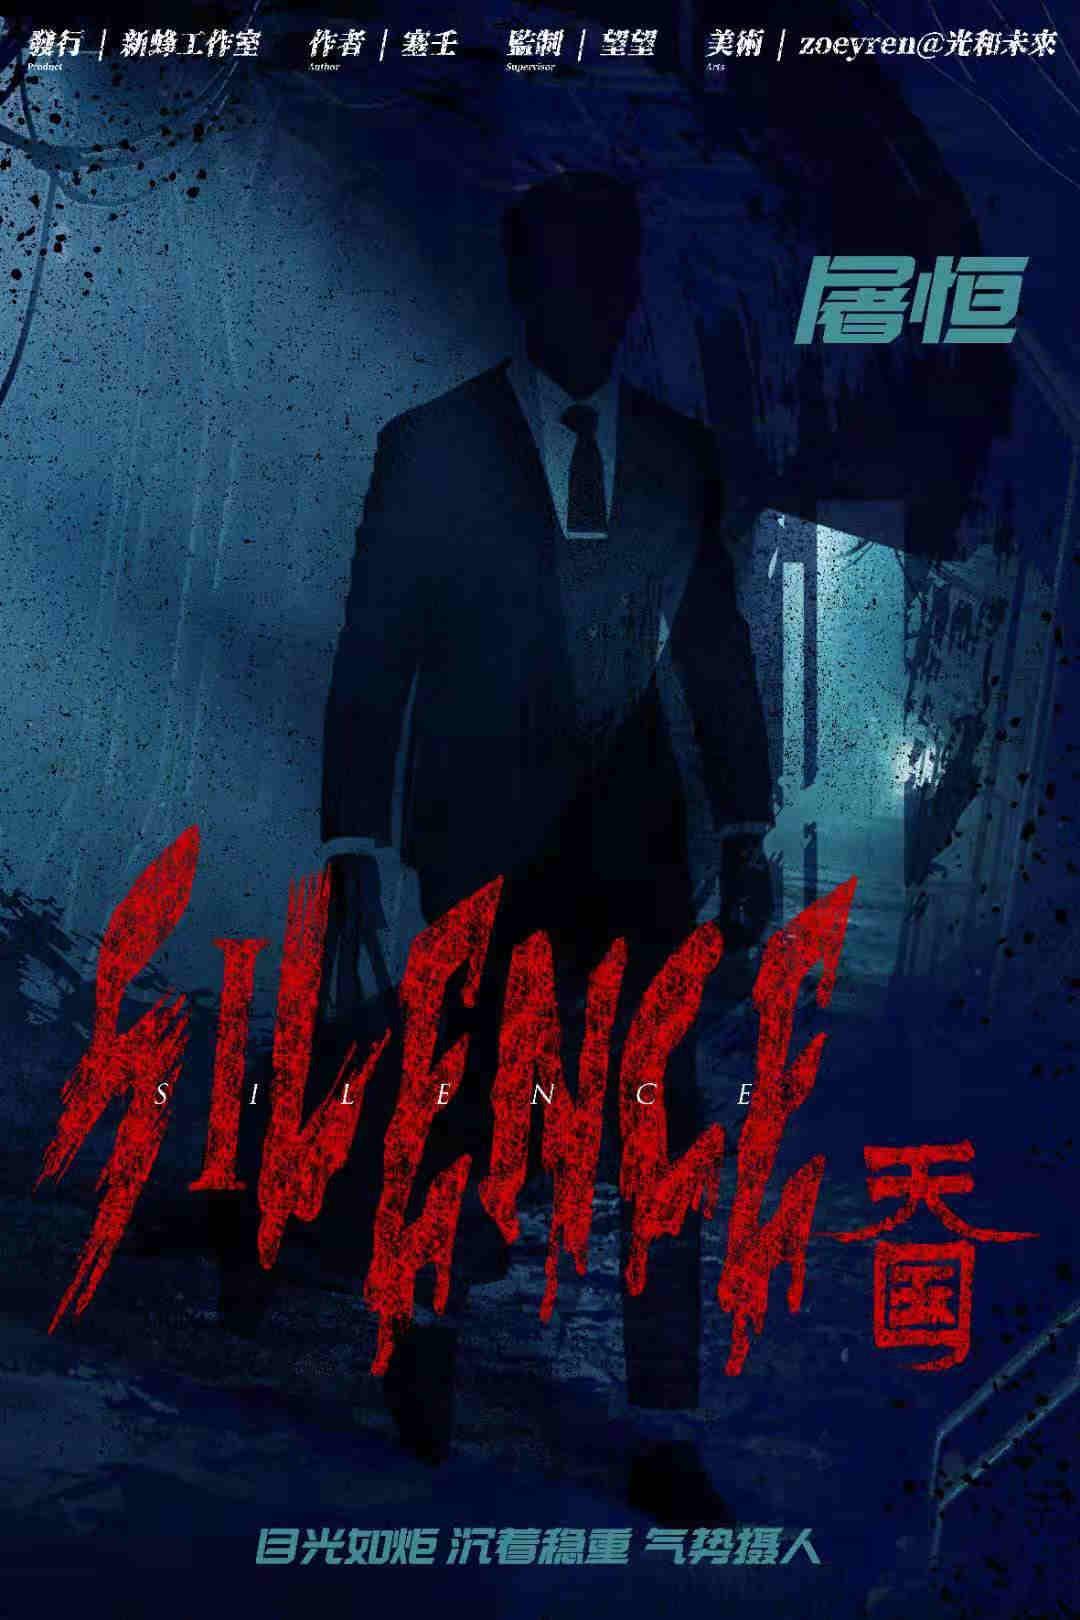 『SILENCE-天国』剧本杀复盘/答案揭秘/案件解析/故事结局真相